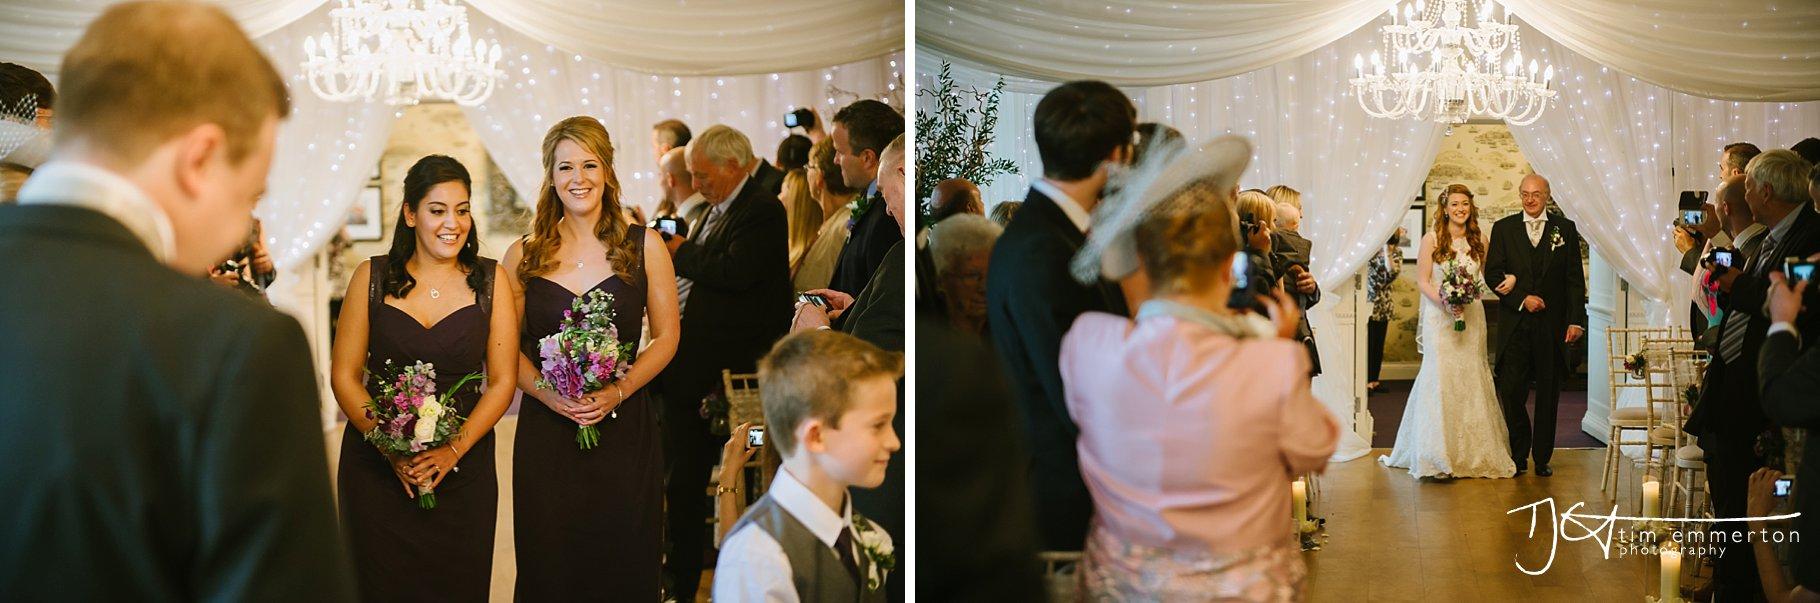 Eaves-Hall-Wedding-Photographer-040.jpg